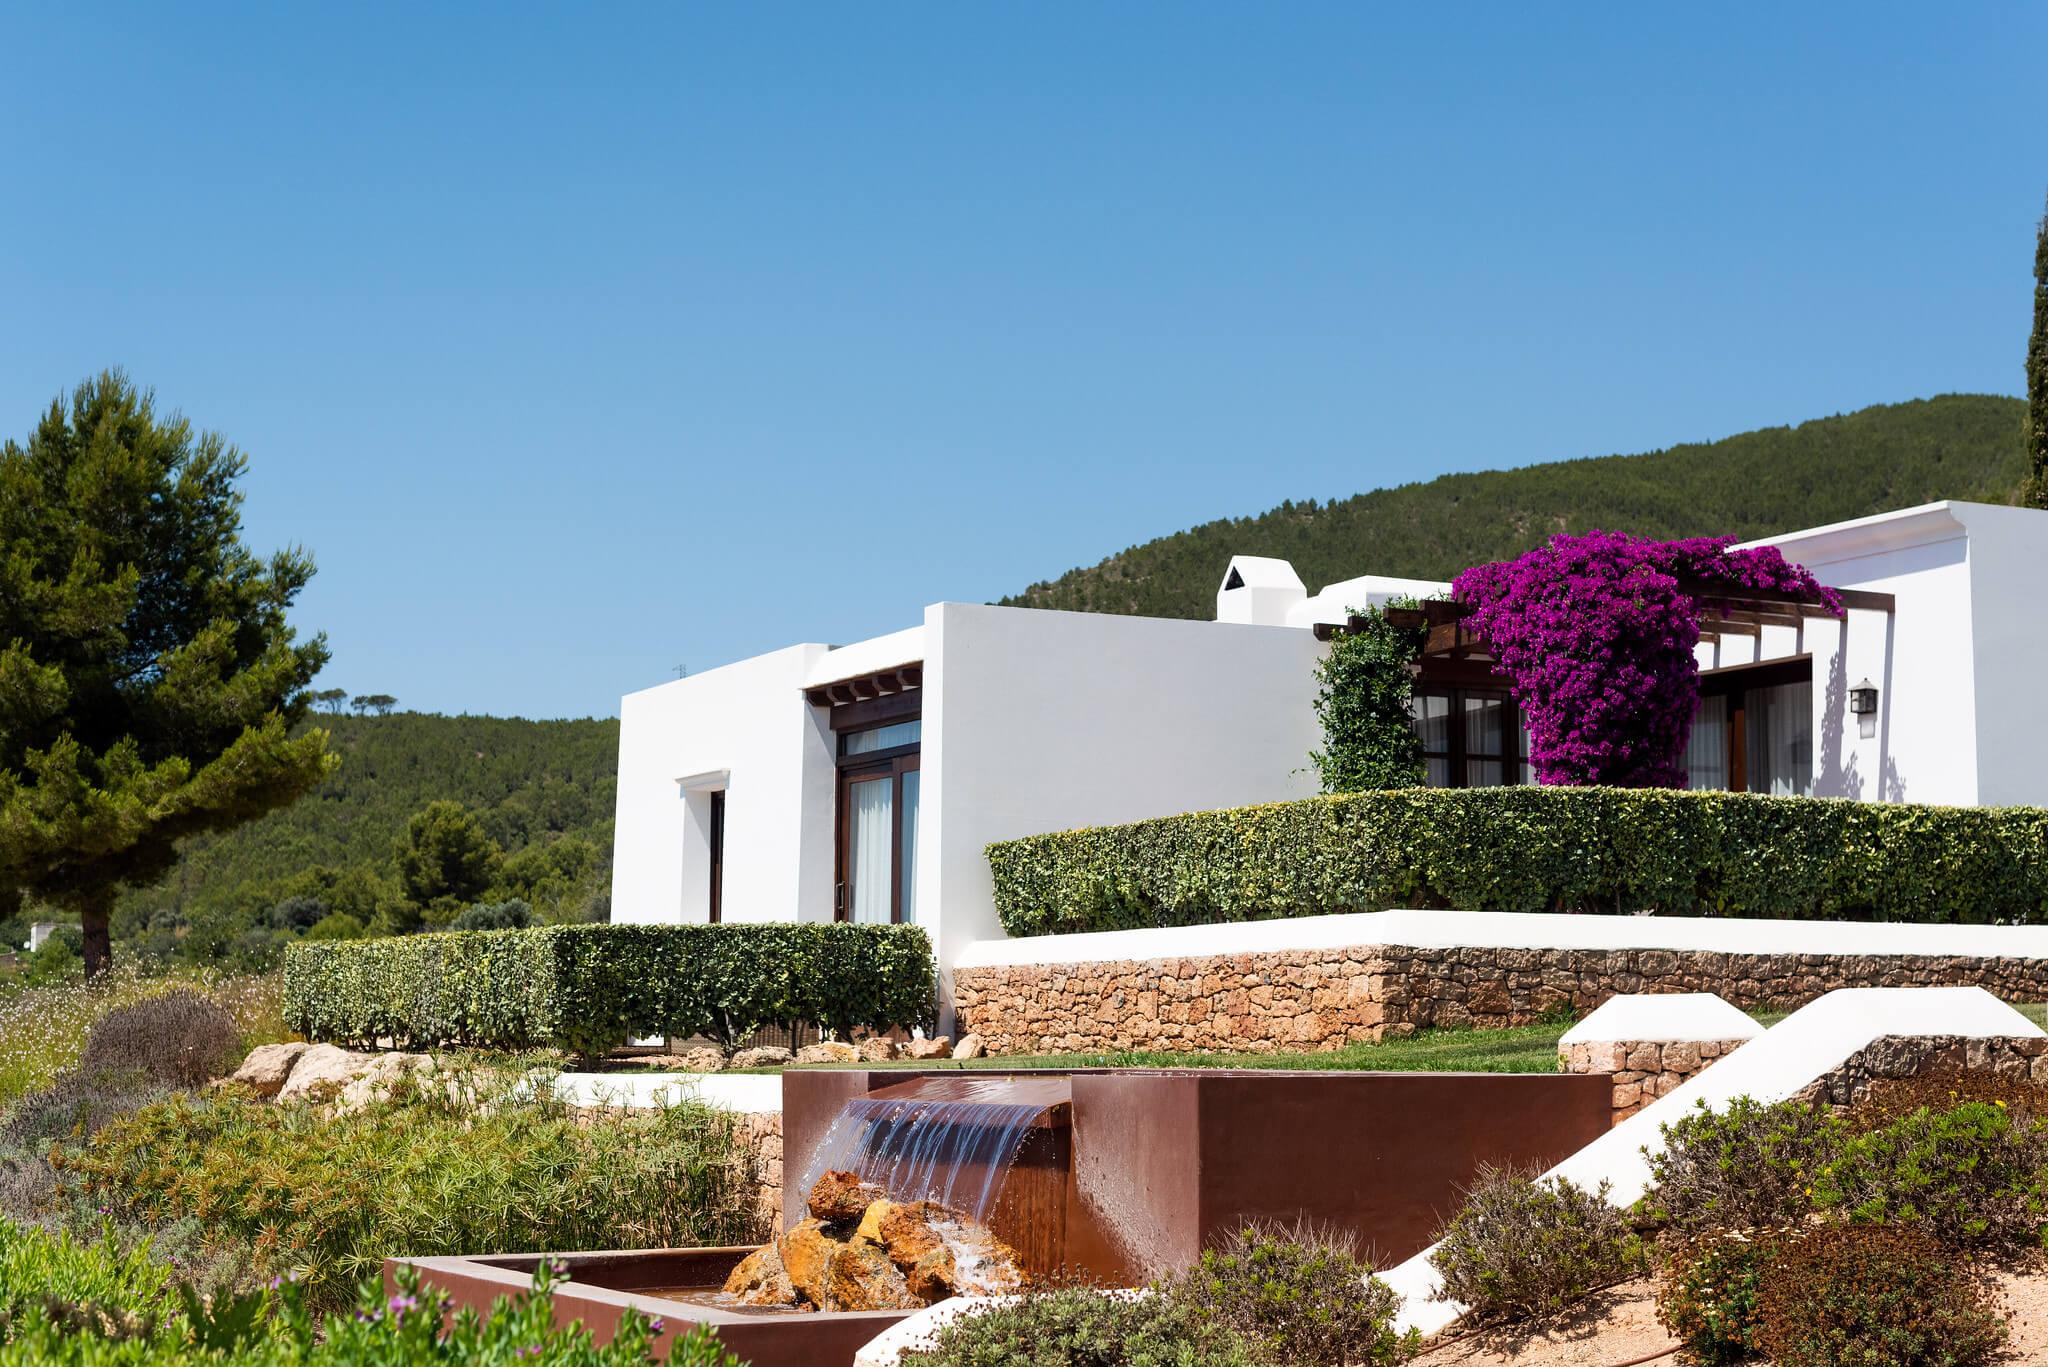 https://www.white-ibiza.com/wp-content/uploads/2020/03/white-ibiza-boutique-hotels-casa-maca-2020-01.jpg